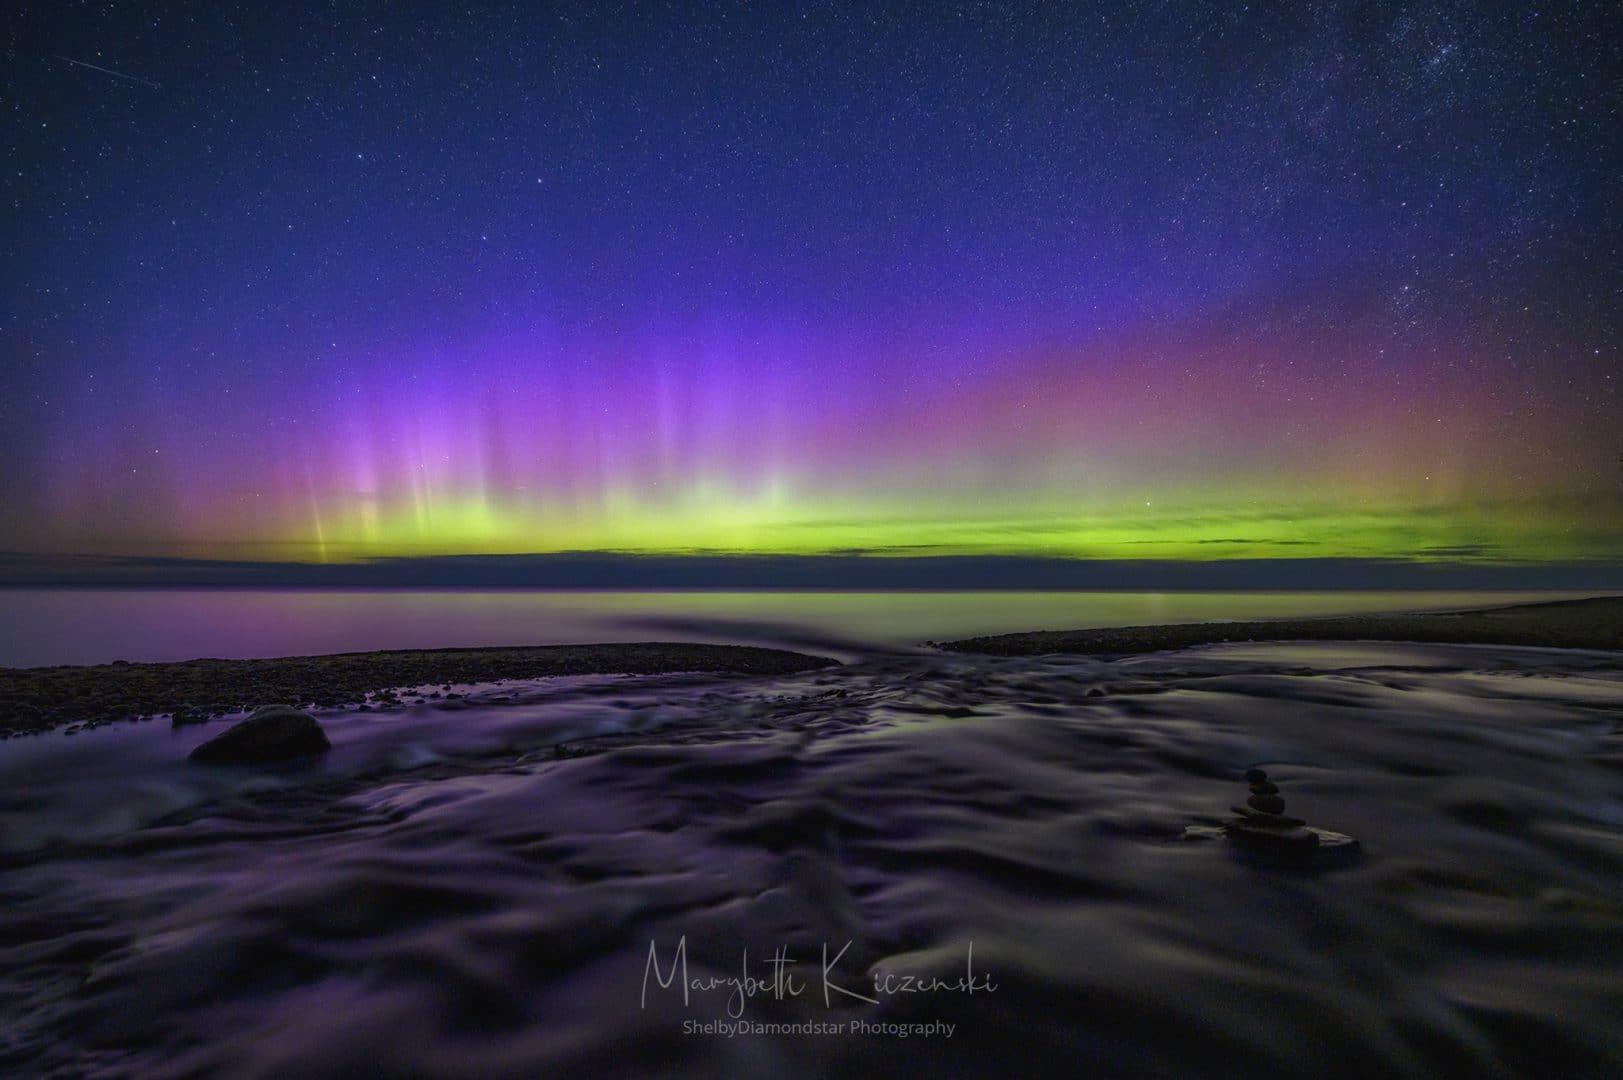 2019 Labor Day Aurora - Wide-angle shot of the pillars on the horizon over the Hurricane River.  (Nikon Z6 - Nikkor 14-24mm) Photo by MaryBeth Kiczenski.